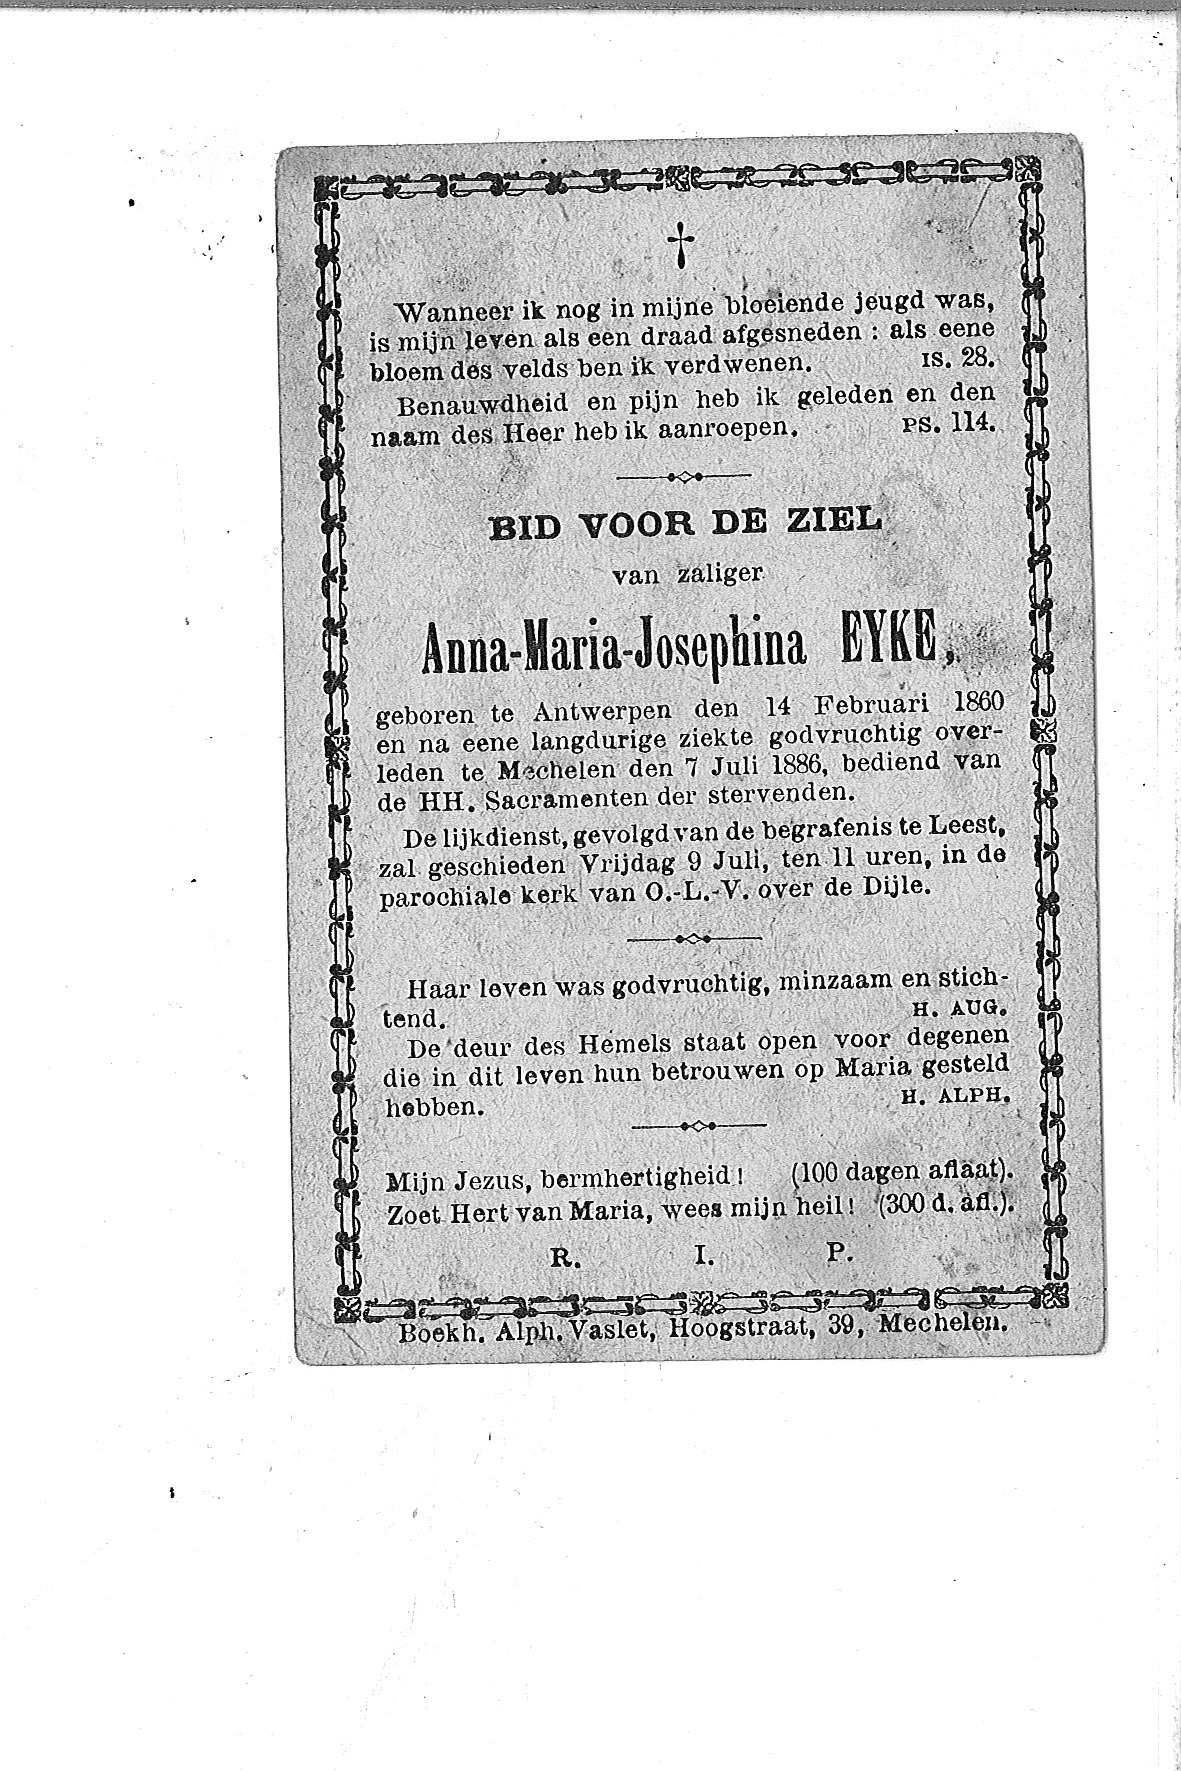 Anna-Maria-Josephina(1886)20120918102725_00030.jpg